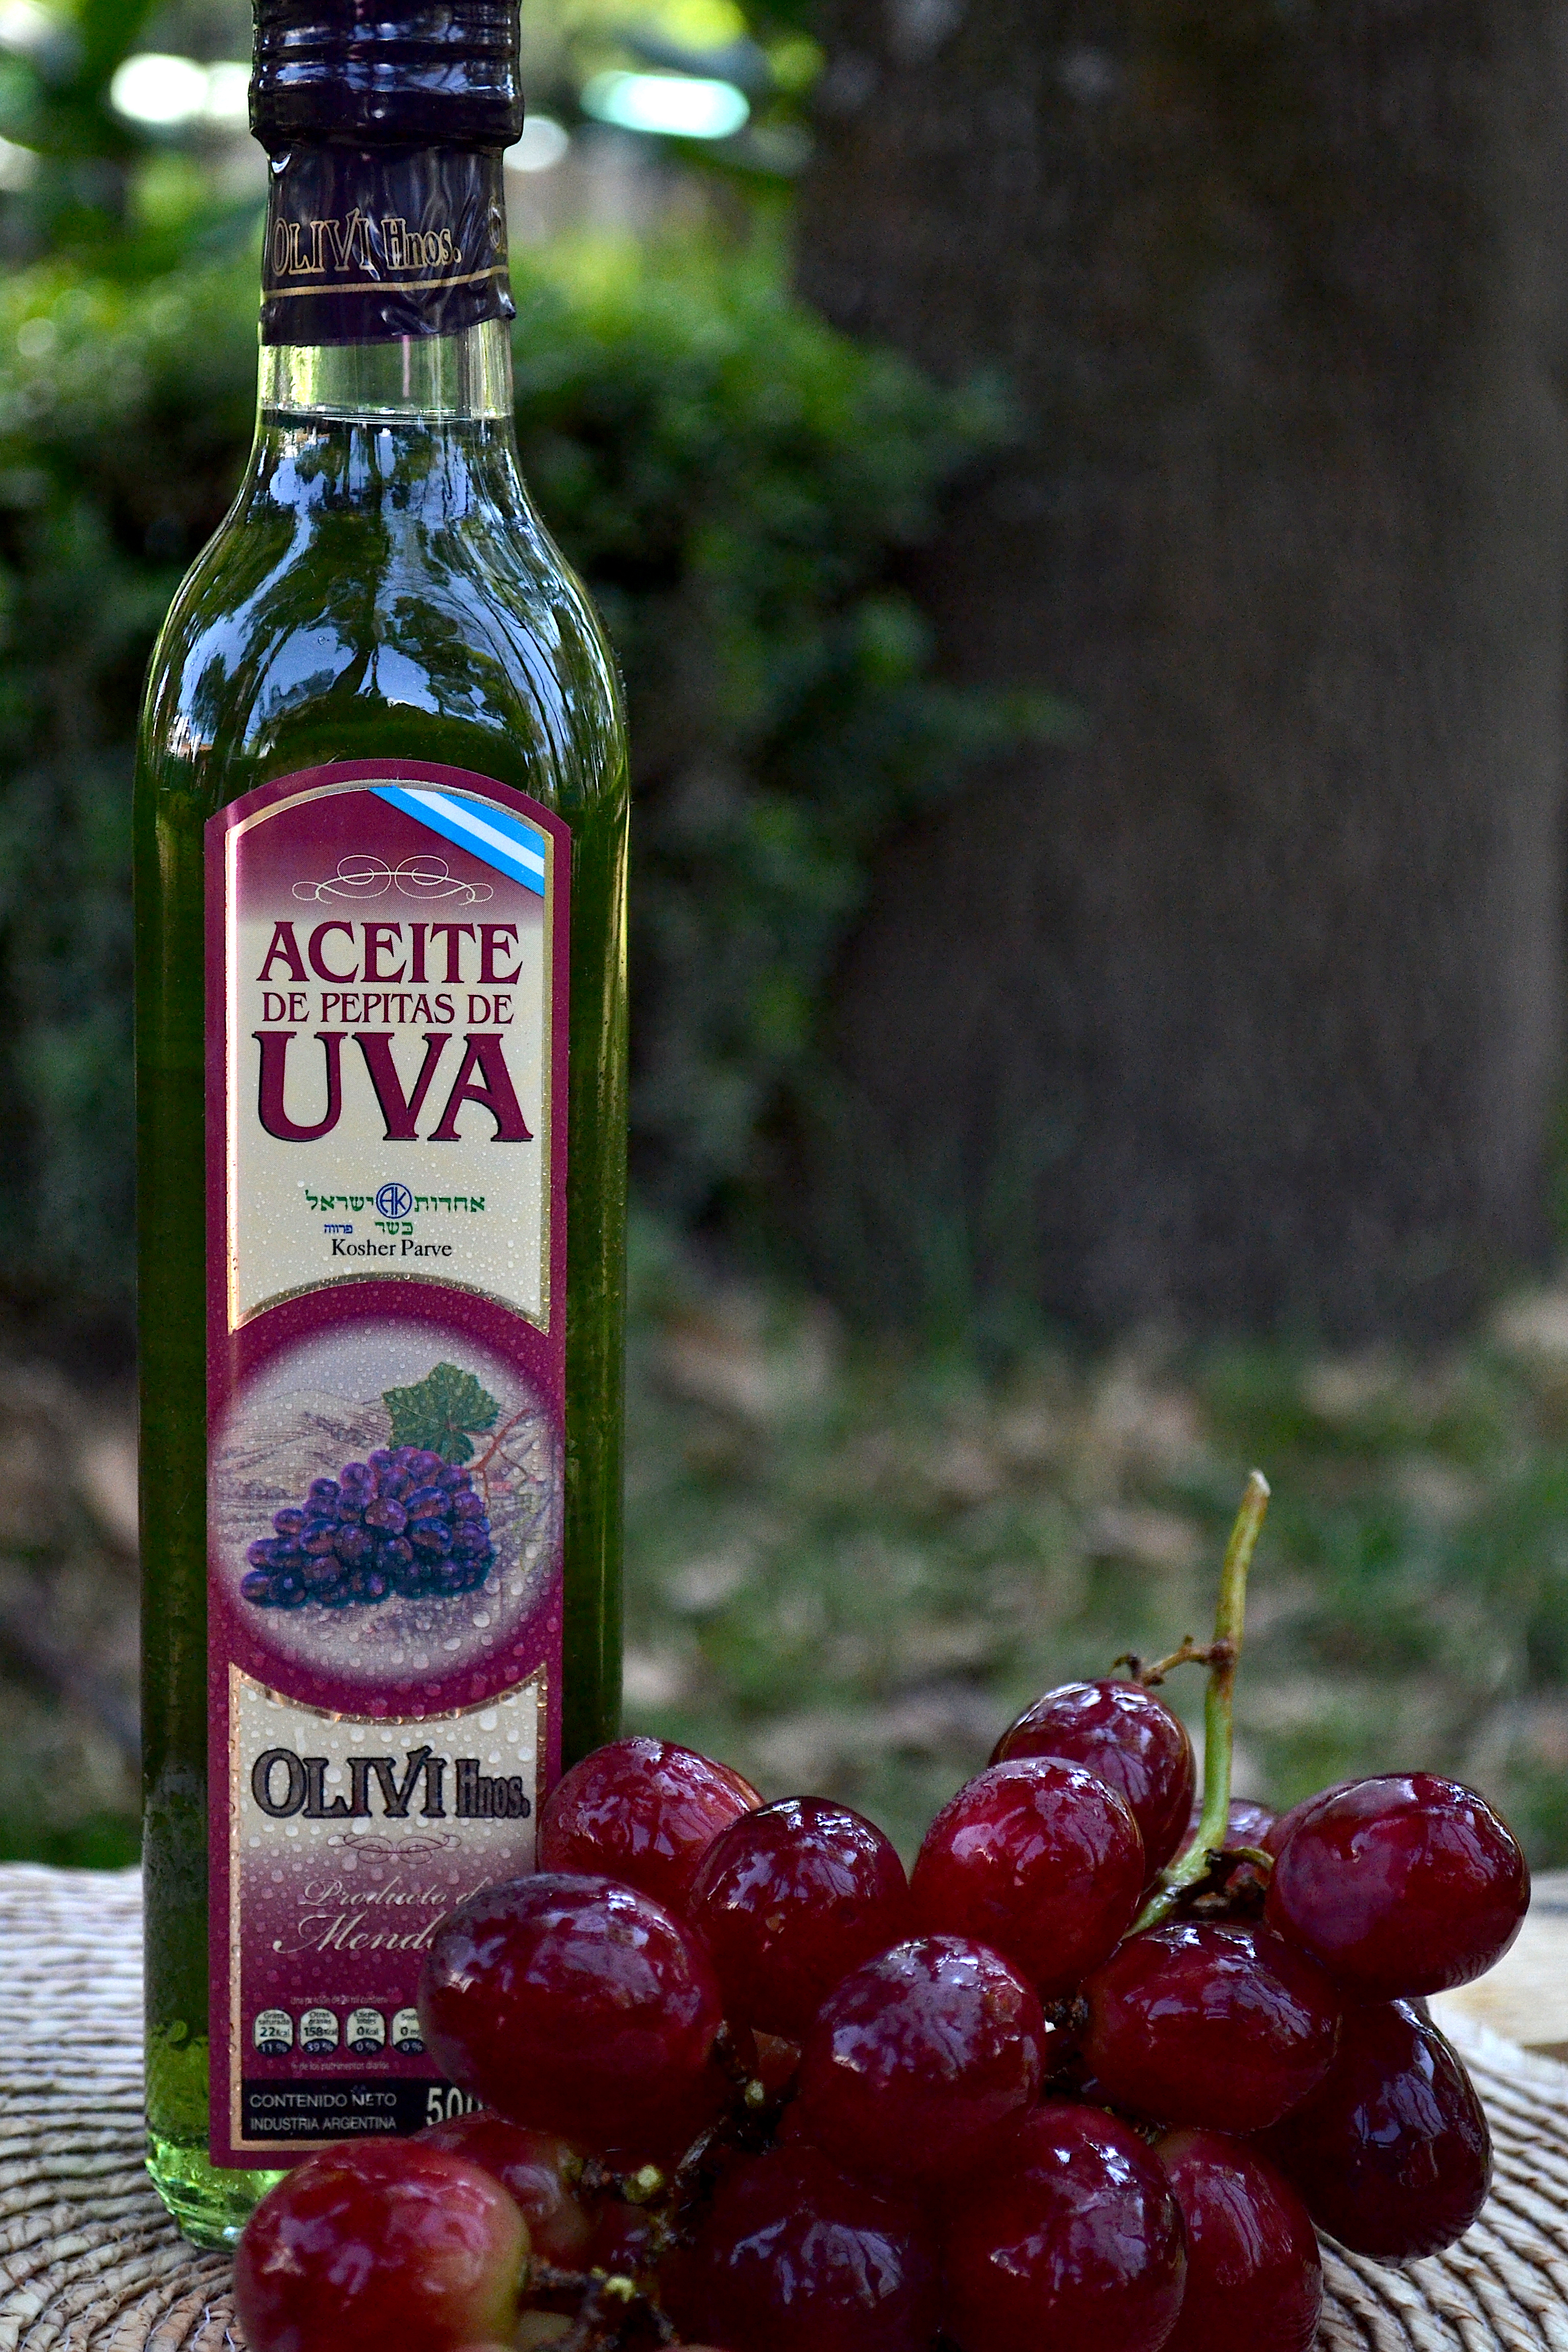 Aceite de uva 500ml.